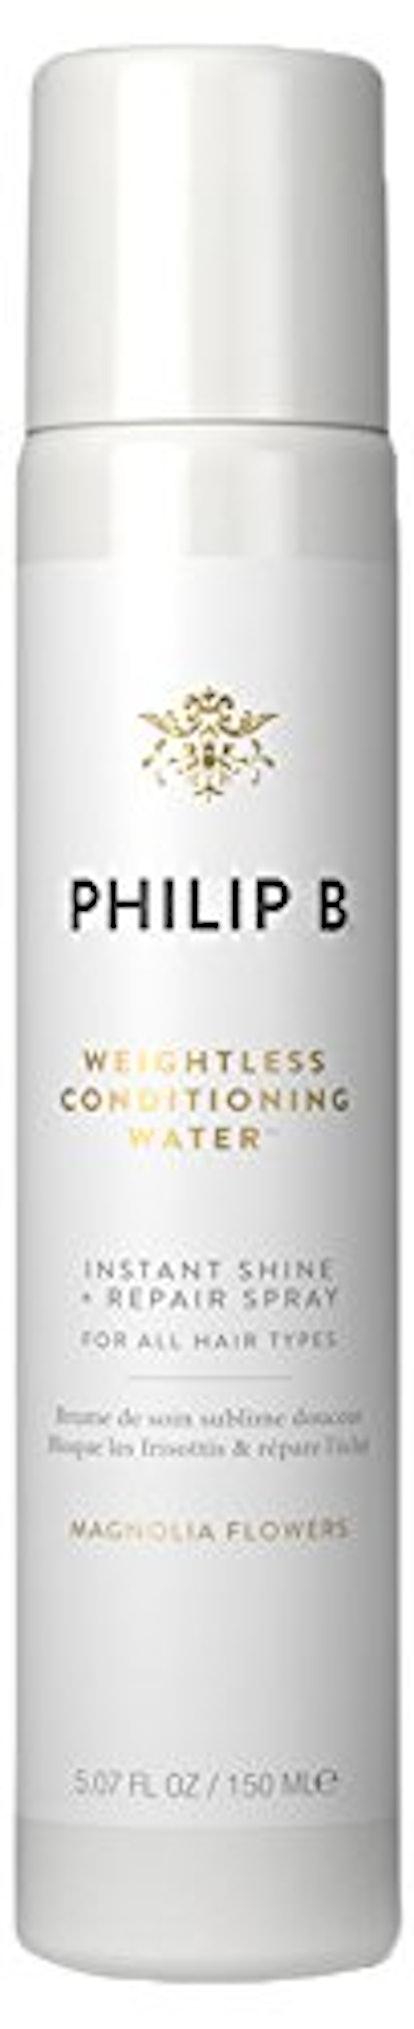 PHILIP B Weightless Conditioning Water